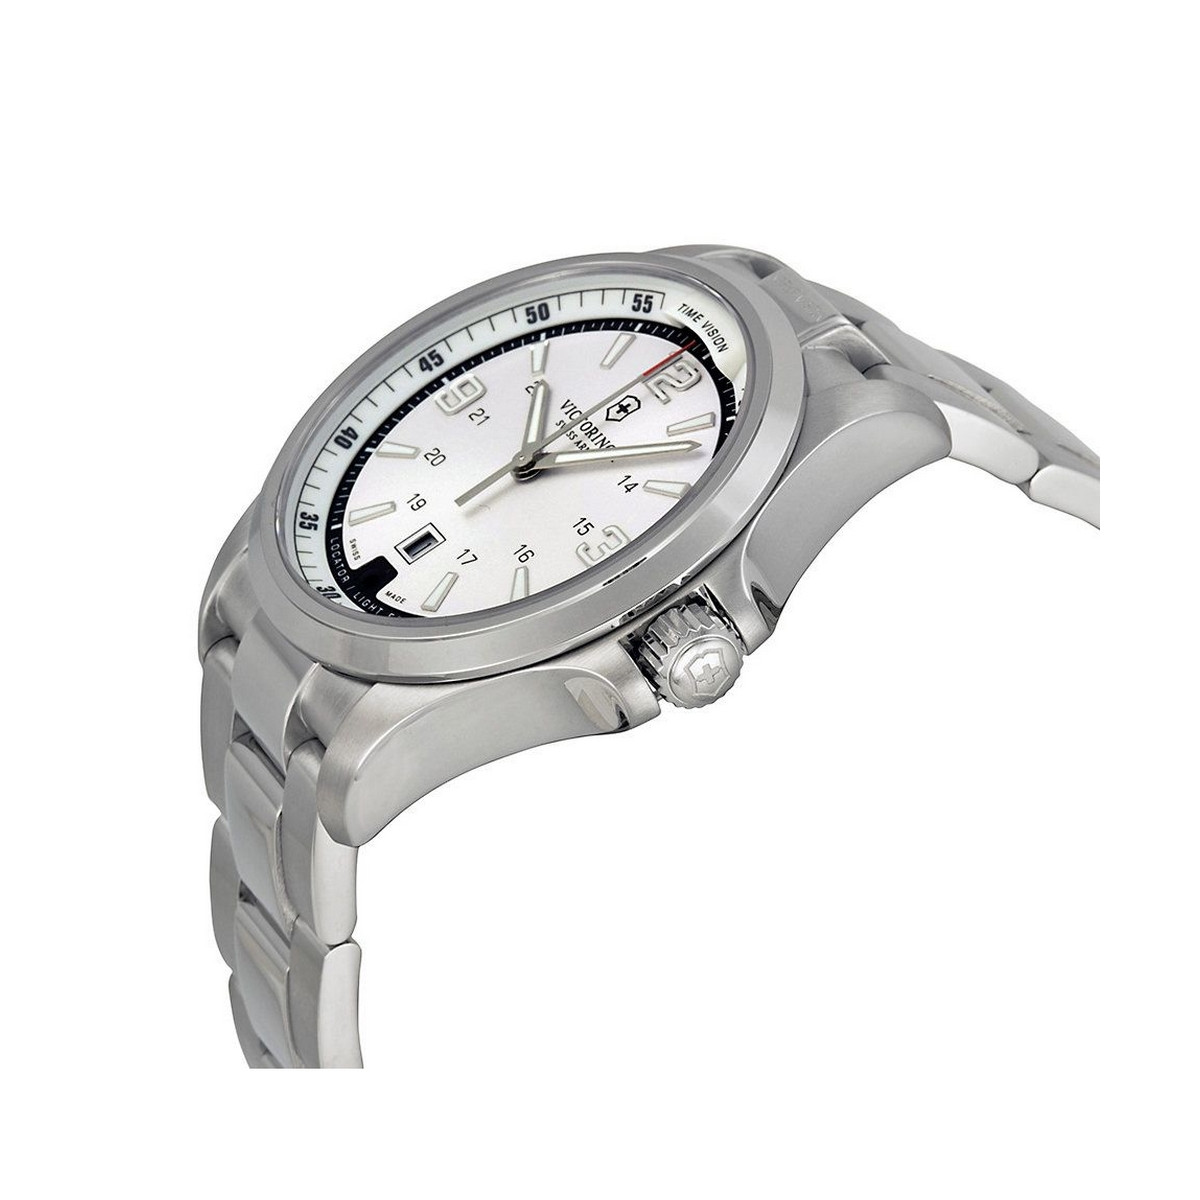 Montre Homme Victorinox NIGHT VISION, cadran blanc argenté - 42 mm